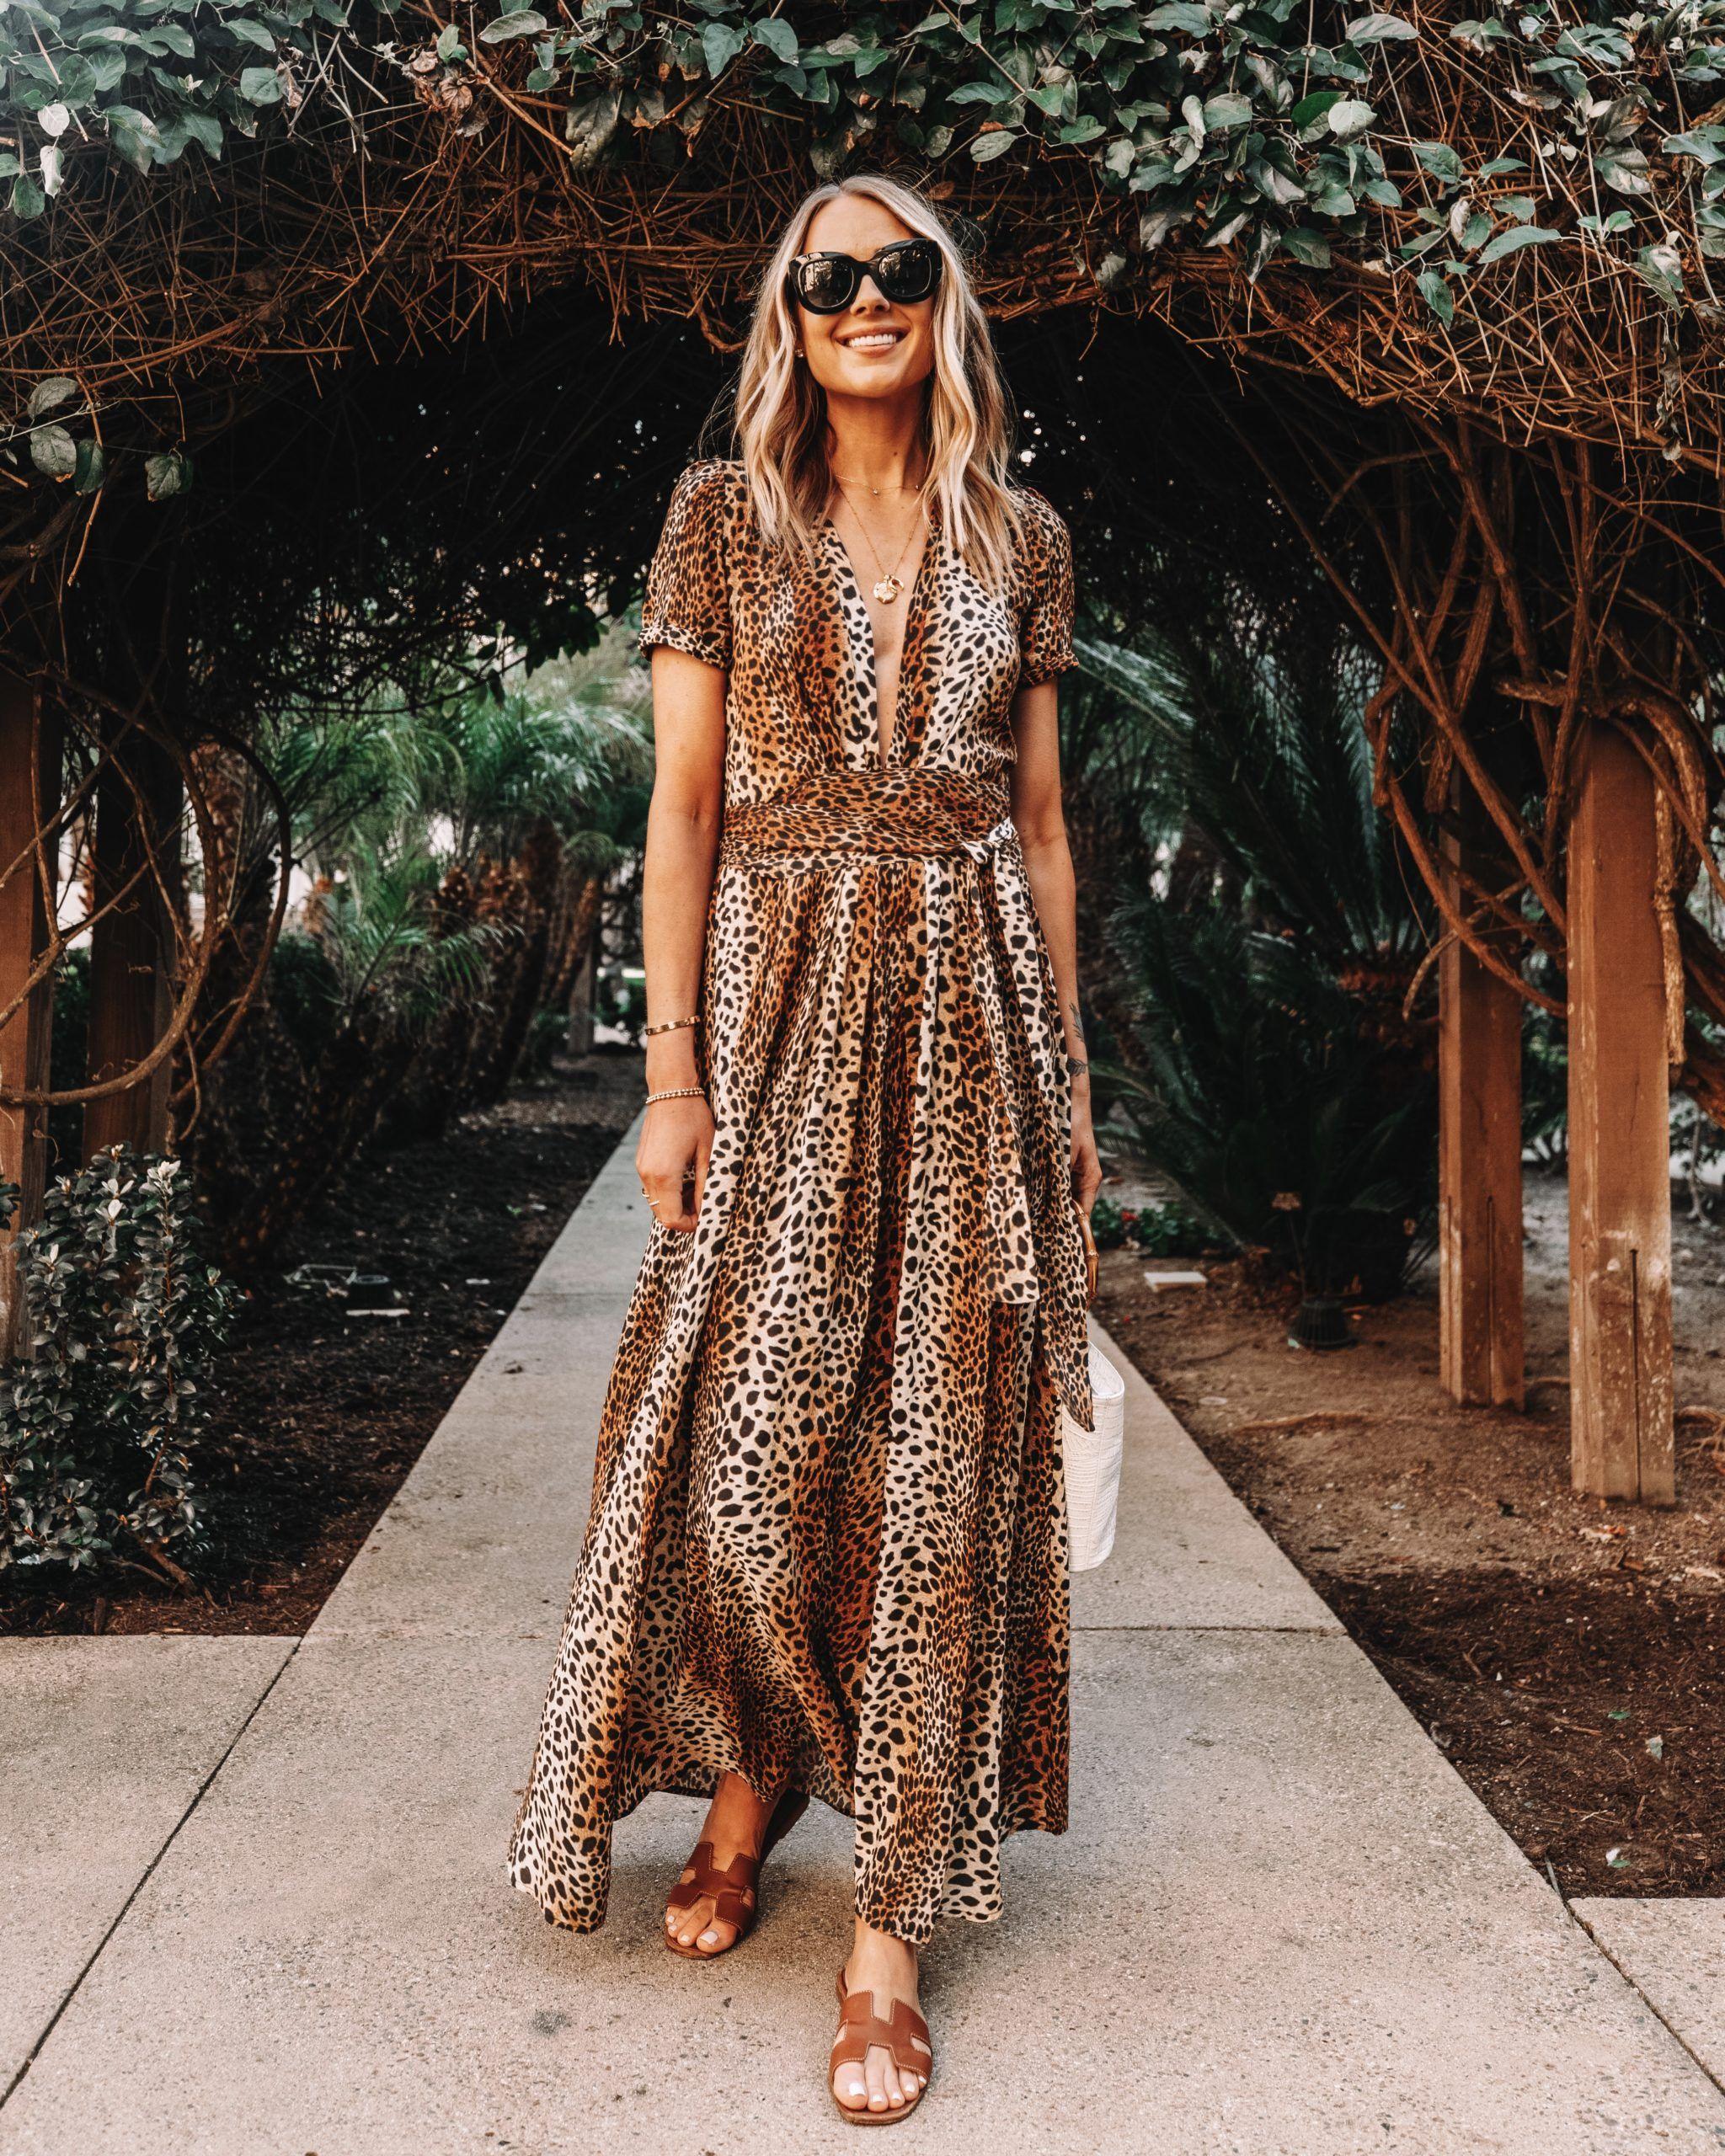 Leopard Dress Vacation Outfit Beach Dress Beach Outfit Summer Dress Summer Outfit Shopbop Leopard Maxi Dress Fashion Jackson Fashion [ 2560 x 2048 Pixel ]